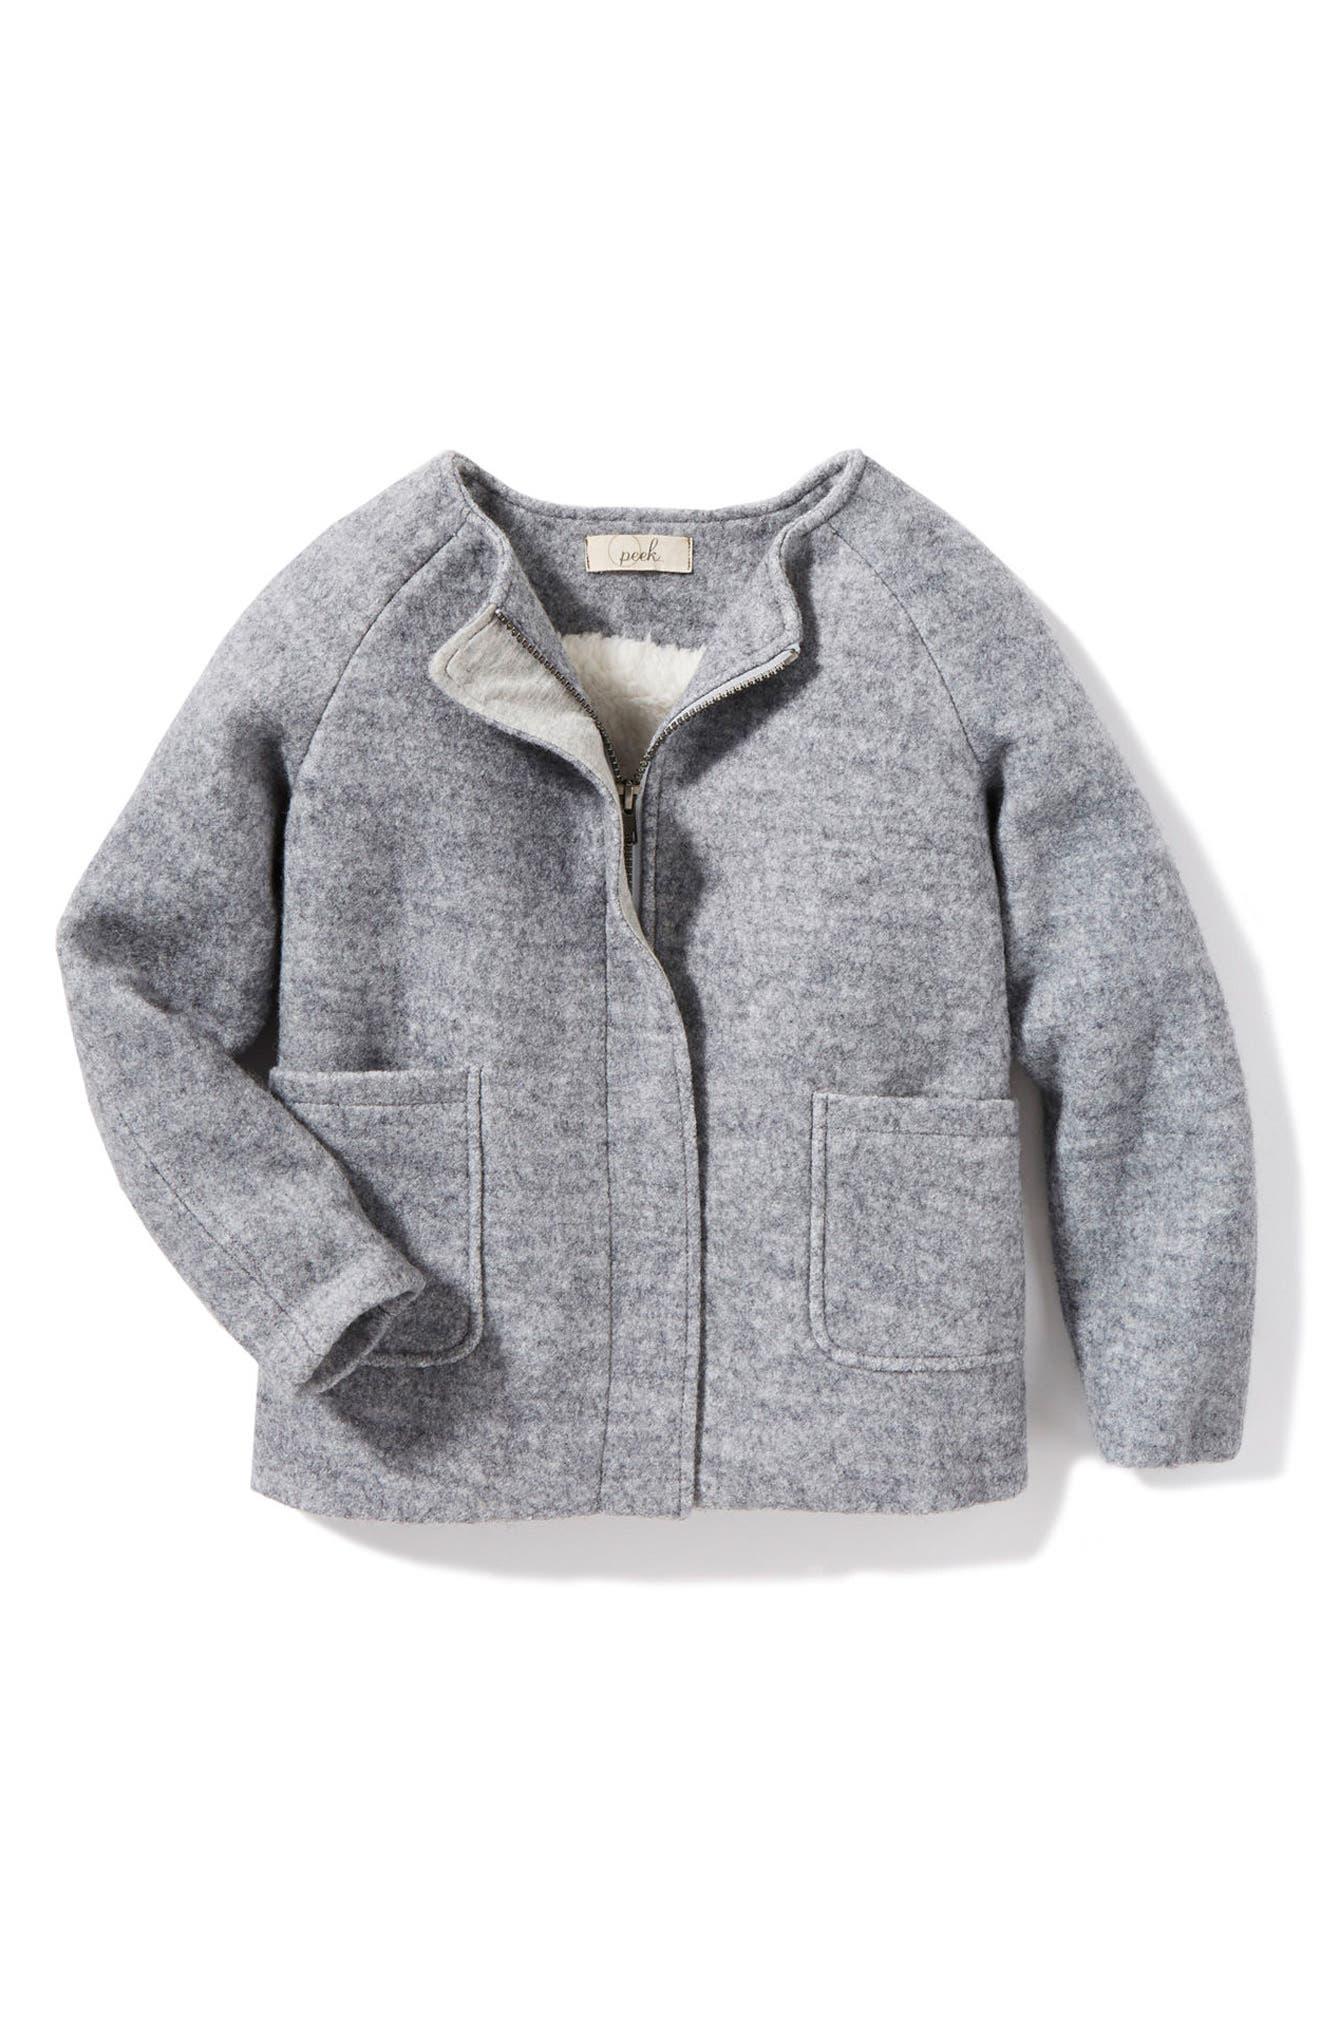 Main Image - Peek Glenda Fleece Jacket (Toddler Girls, Little Girls & Big Girls)